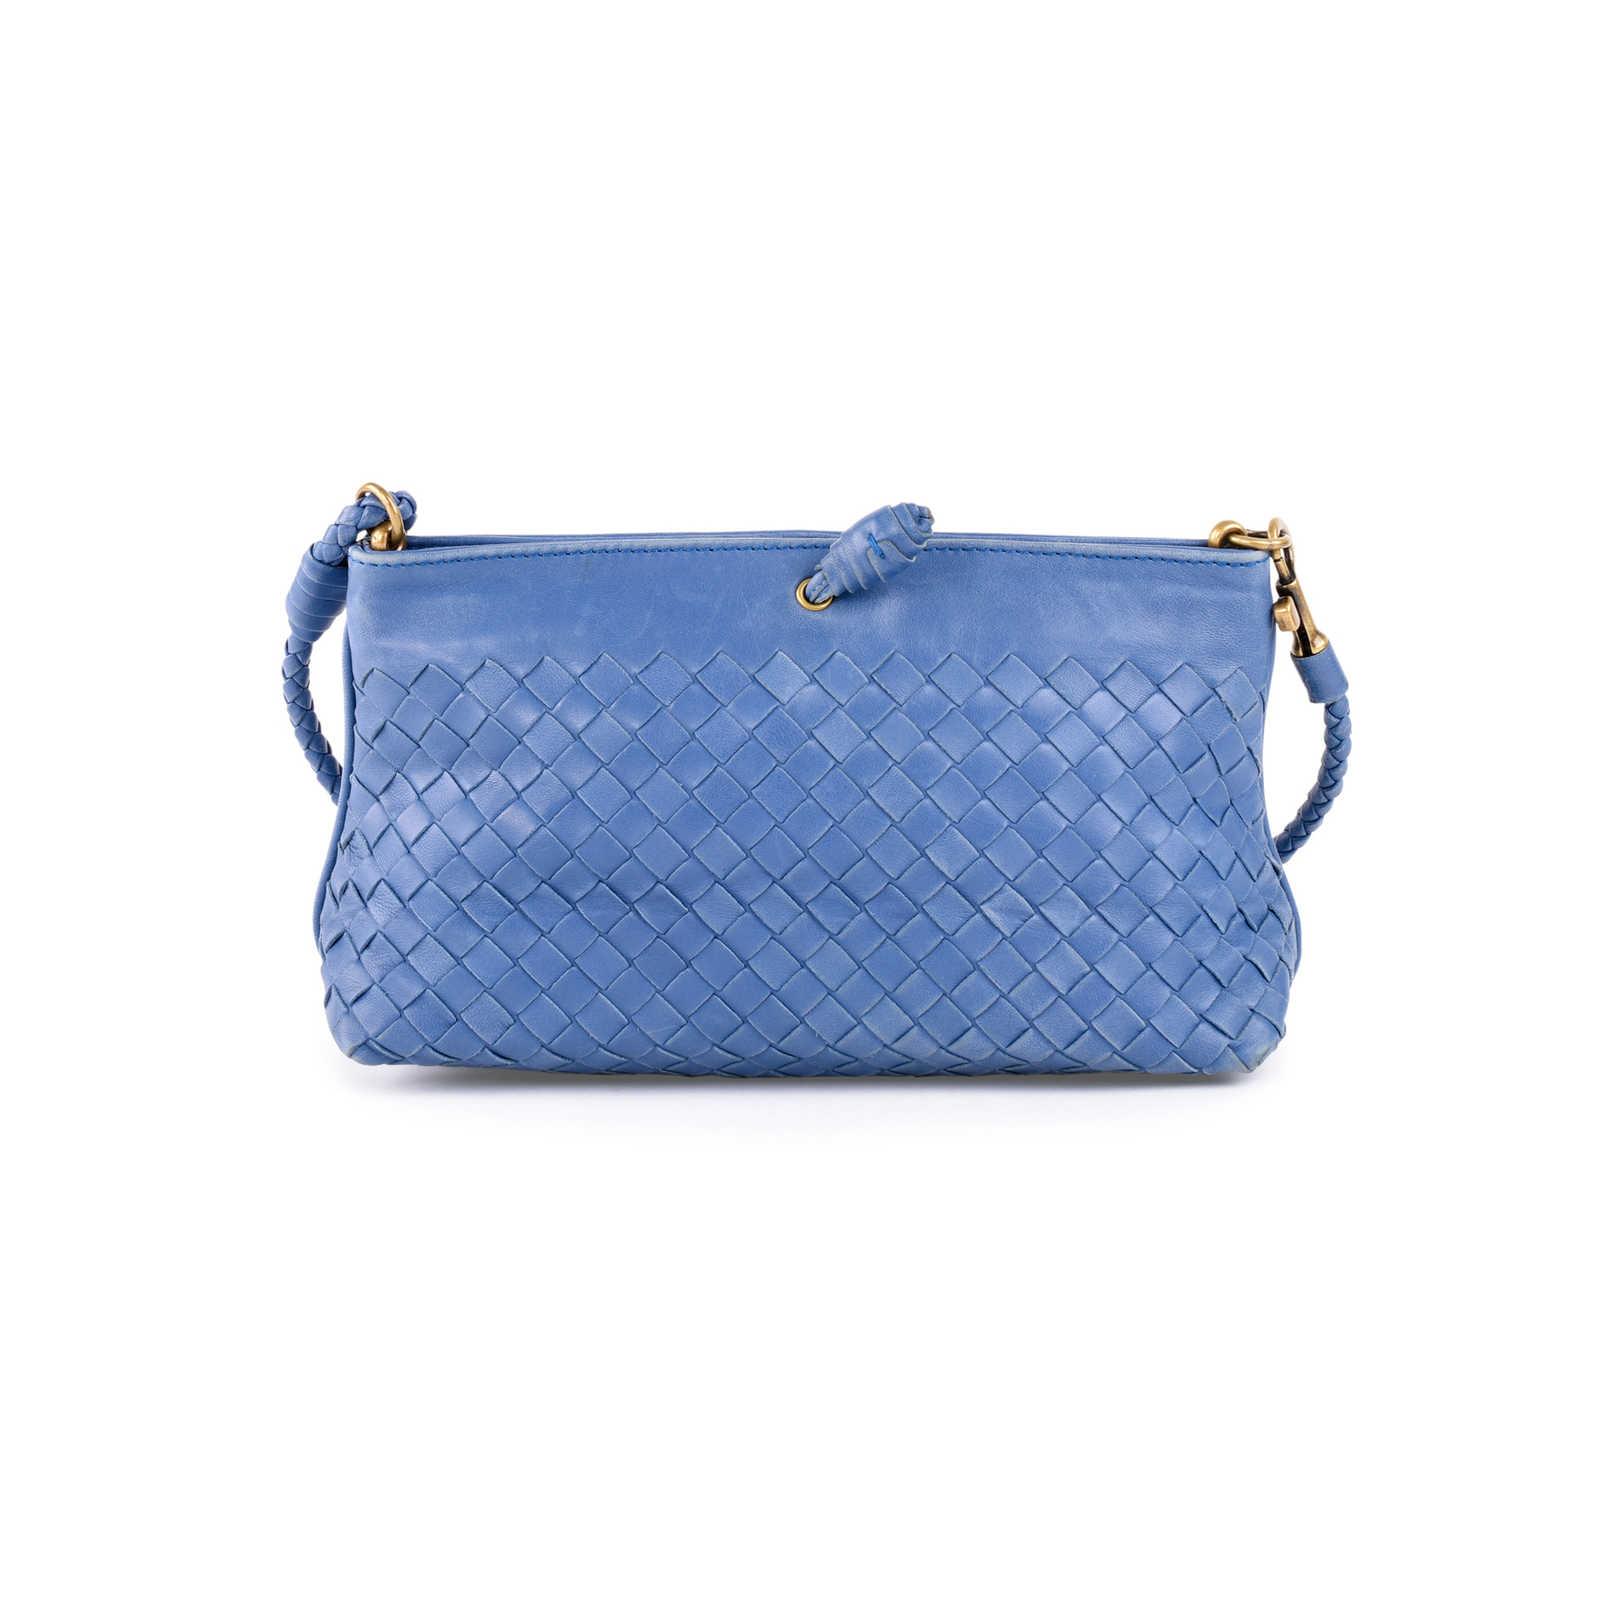 74b34ae701 ... Authentic Second Hand Bottega Veneta Intrecciato Small Leather Shoulder  Bag (PSS-462-00032 ...